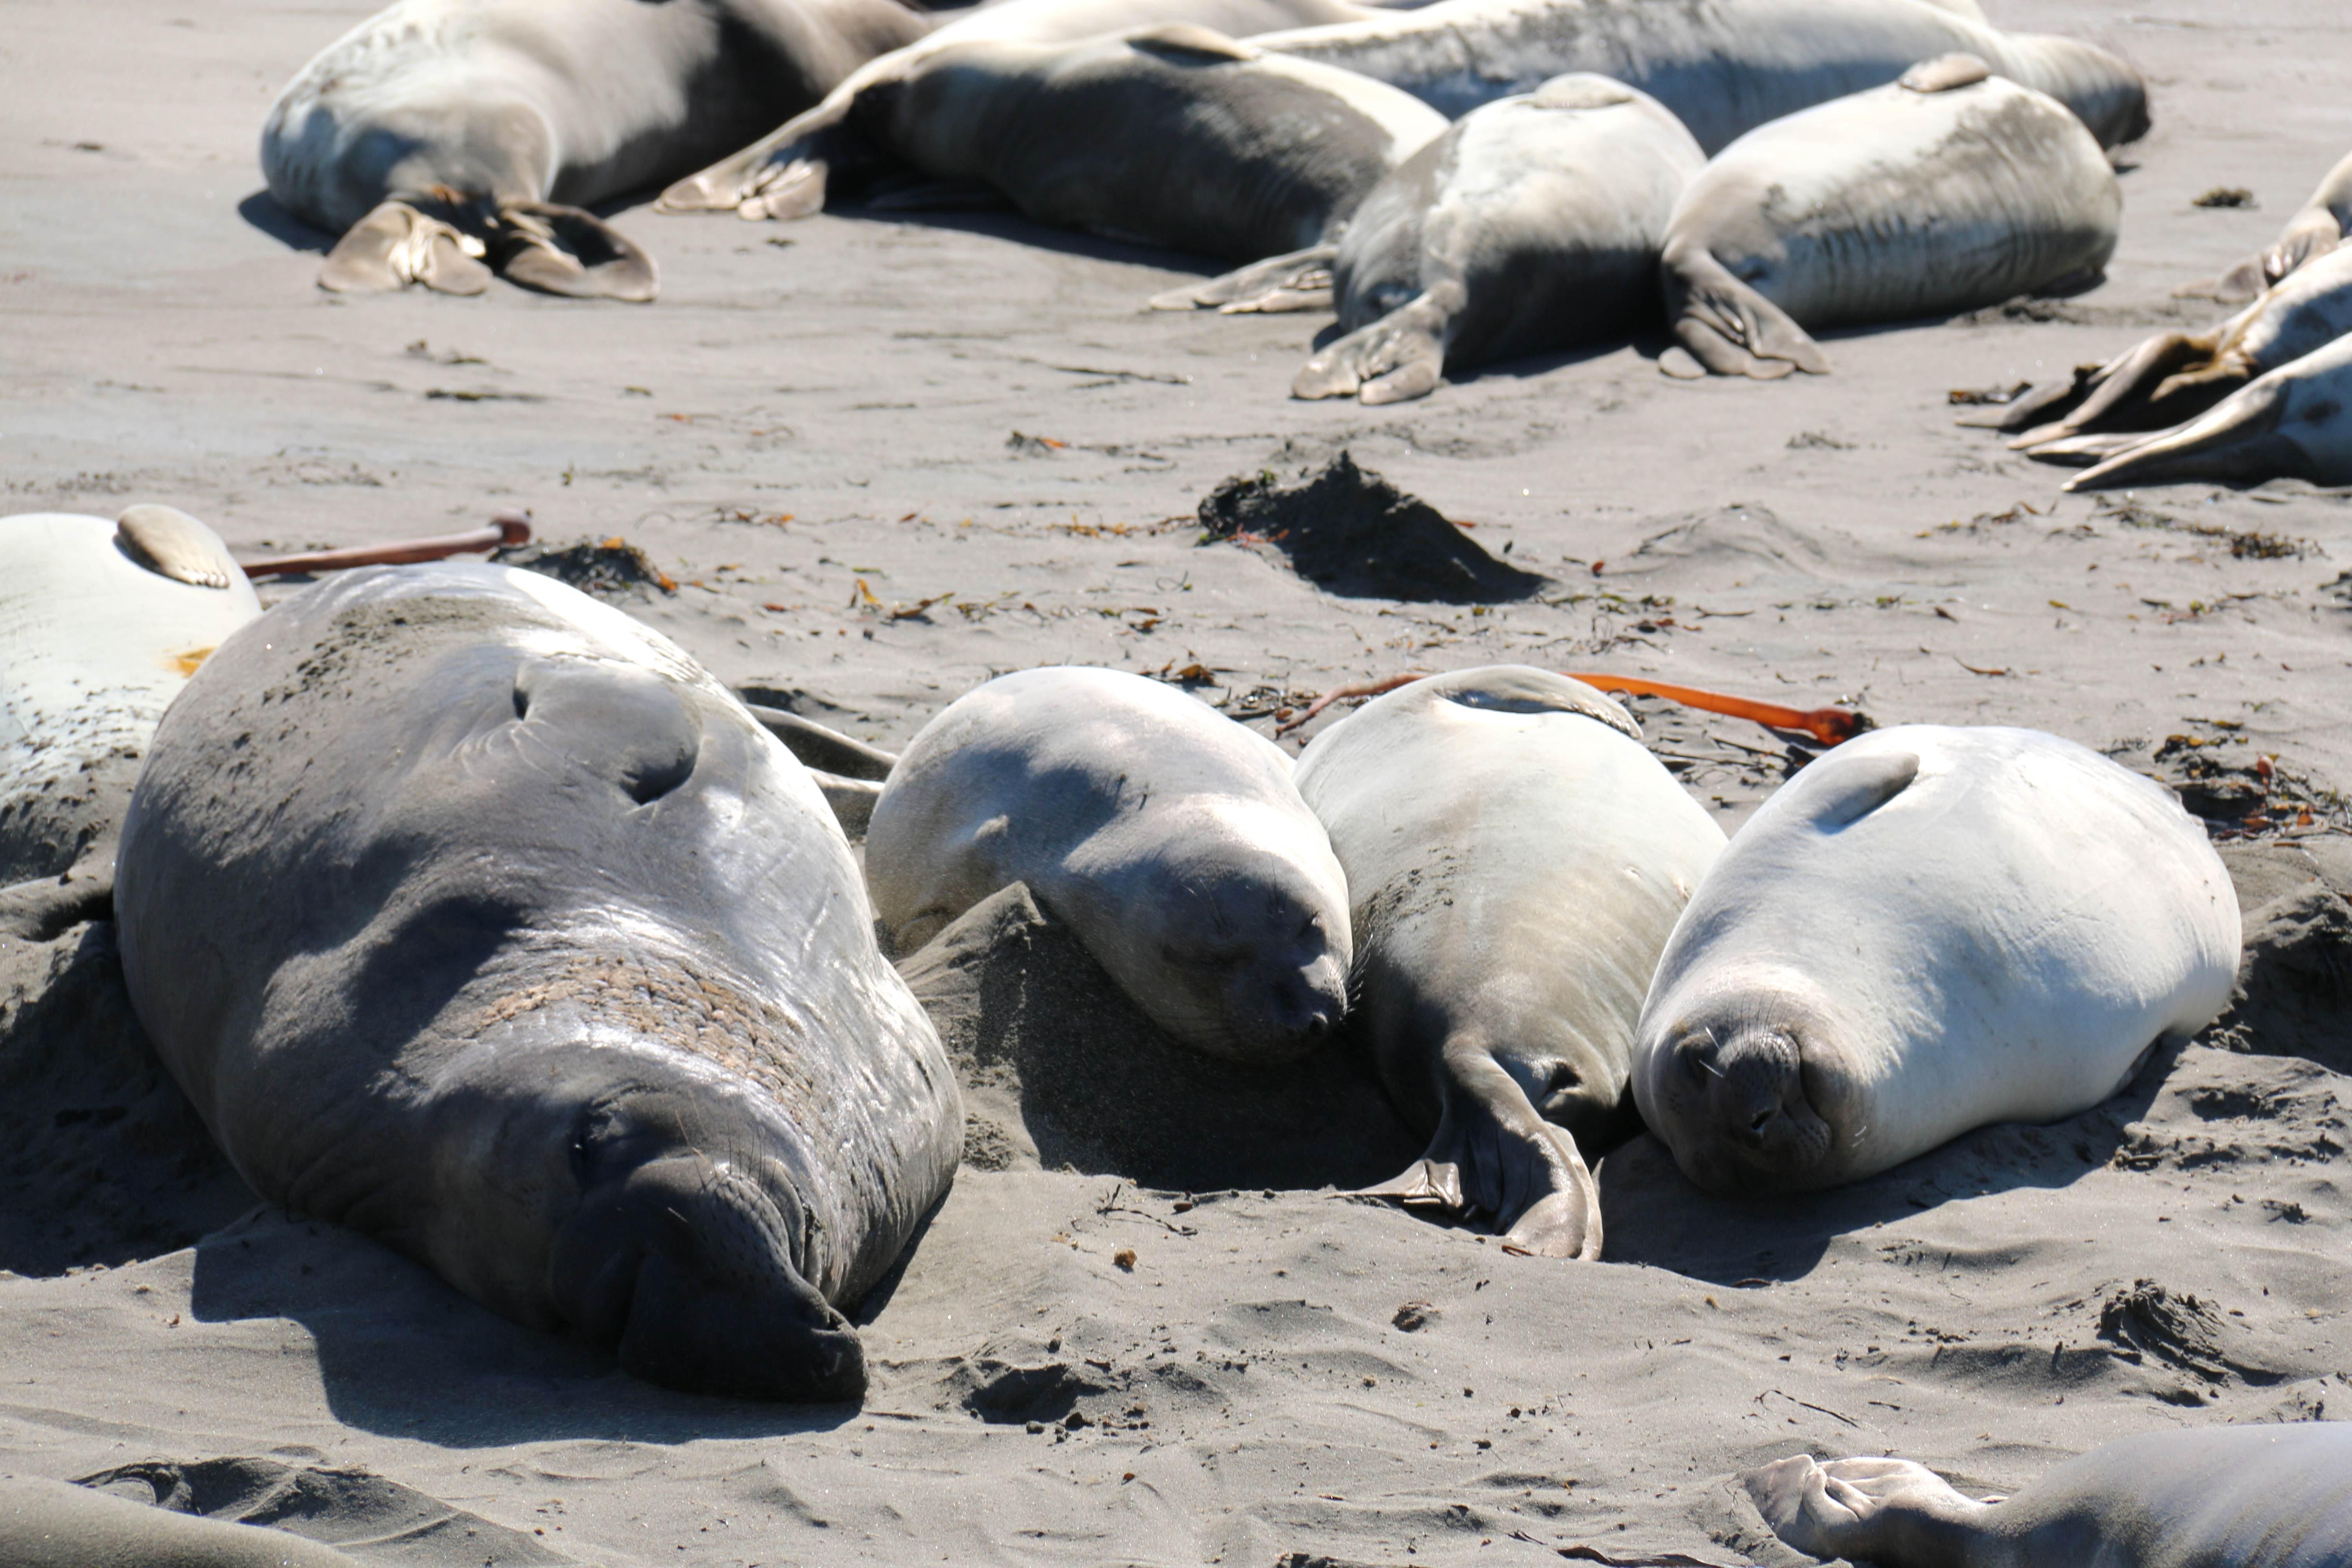 Free photograph; elephant, seals, beach, sand, marine, mammals, animals